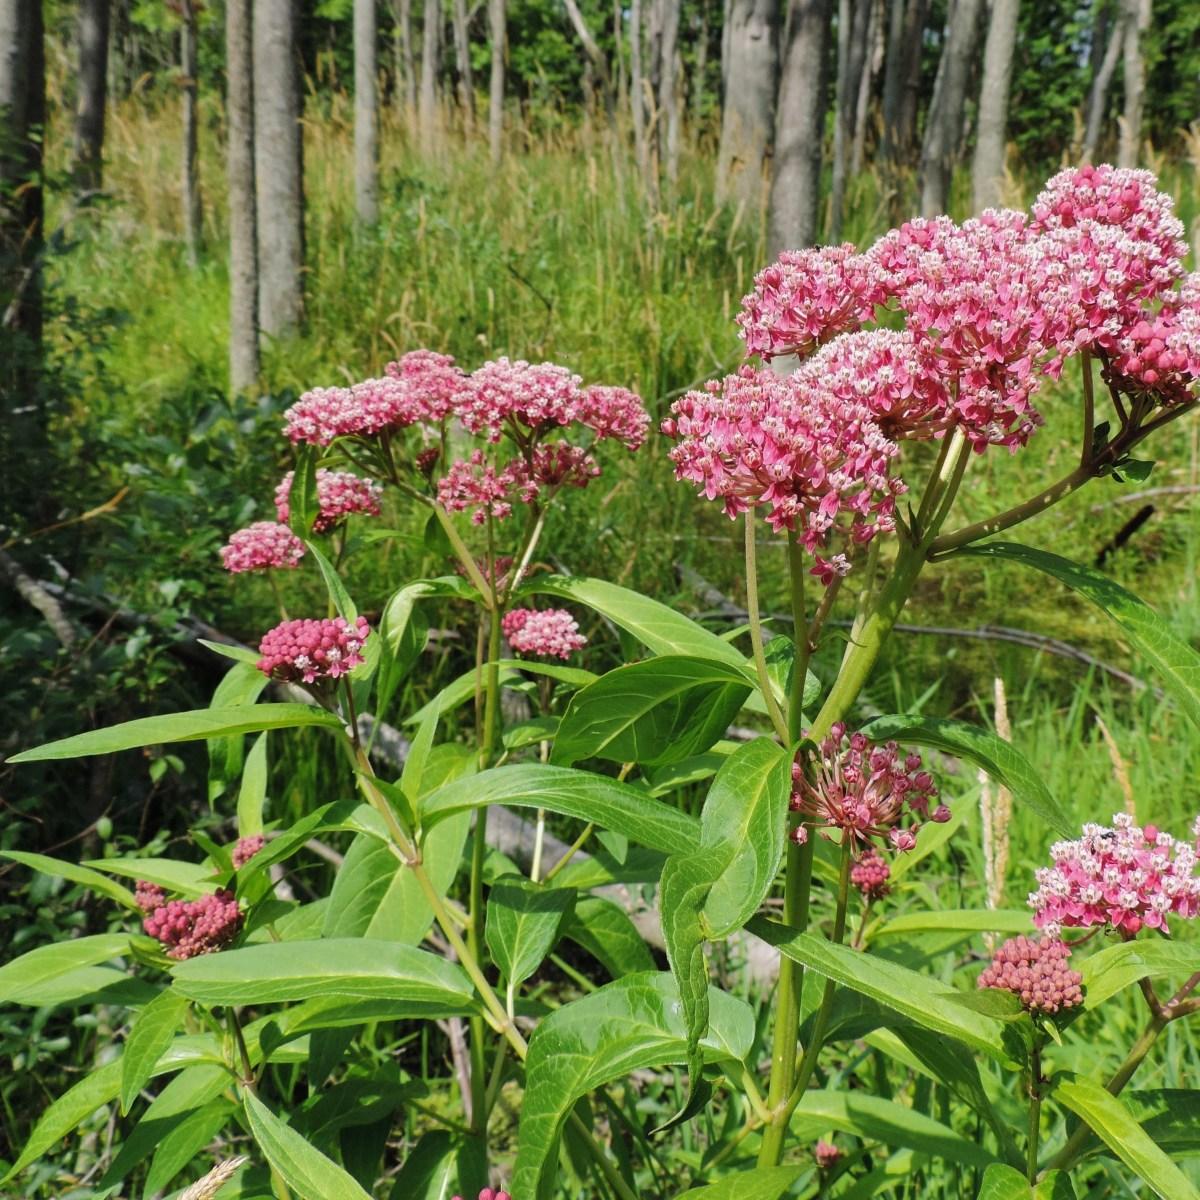 Swamp milkweed growing in a wooded area